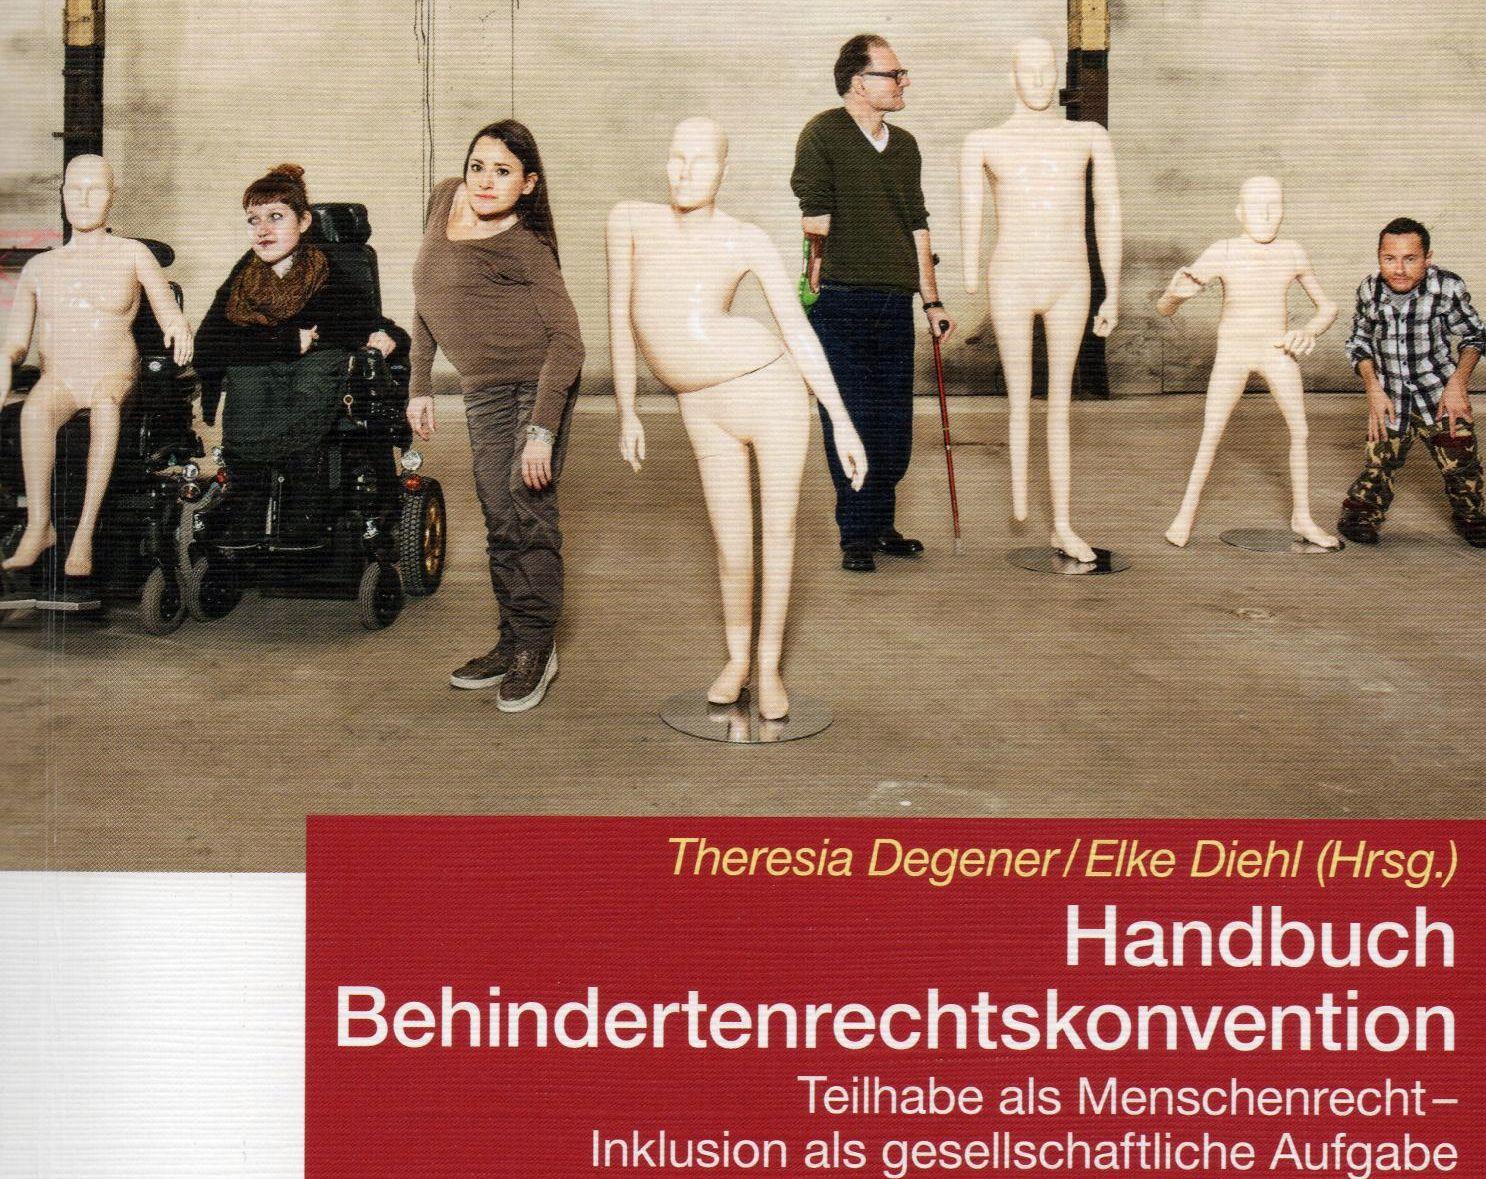 Handbuch-1